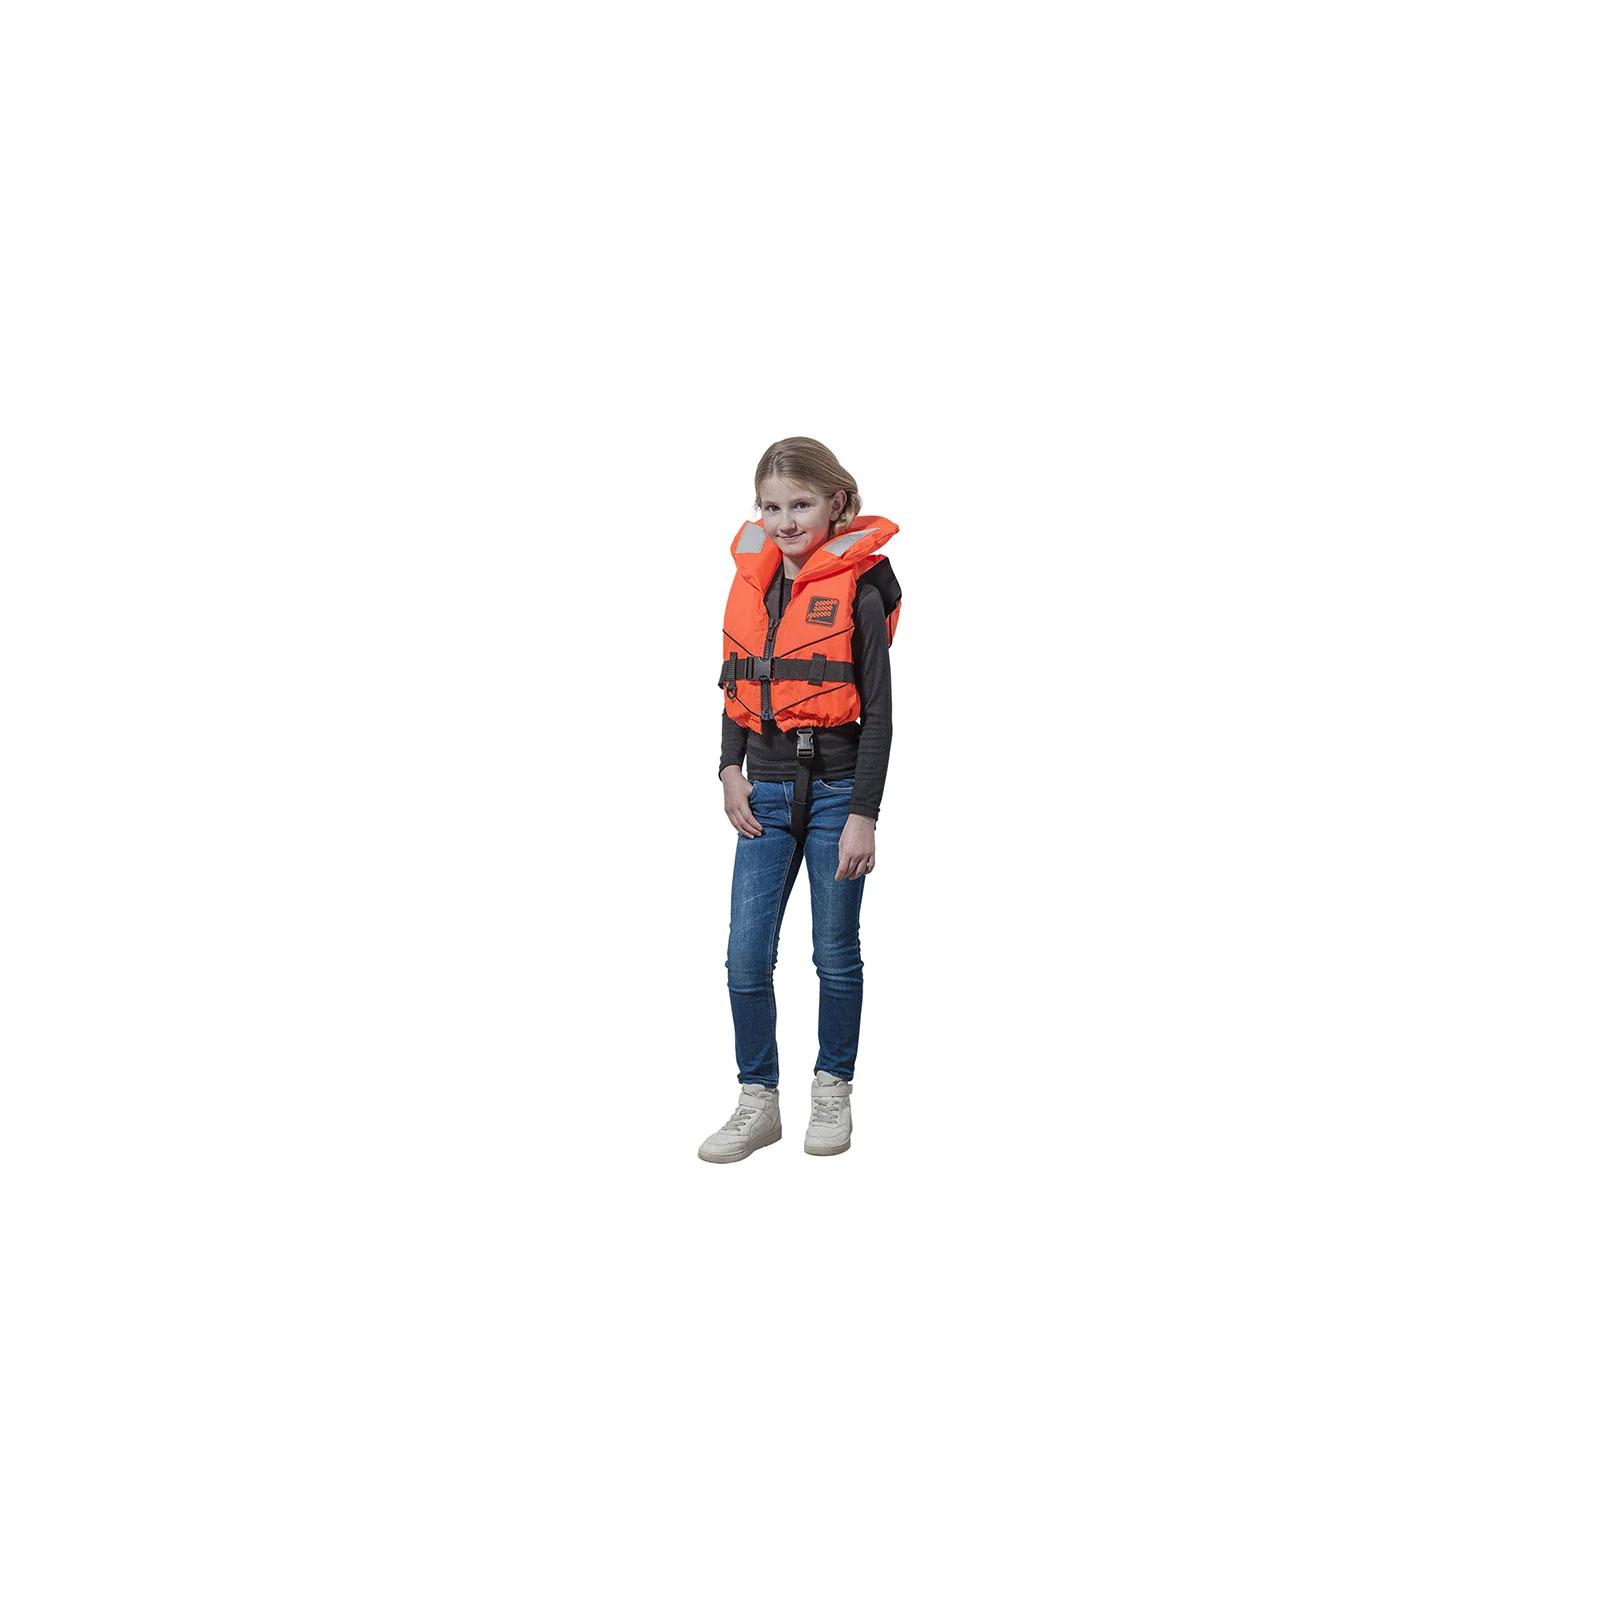 Rettungsweste Schwimmweste Tornado XS child 5-15kg 30N / ISO 12402-4